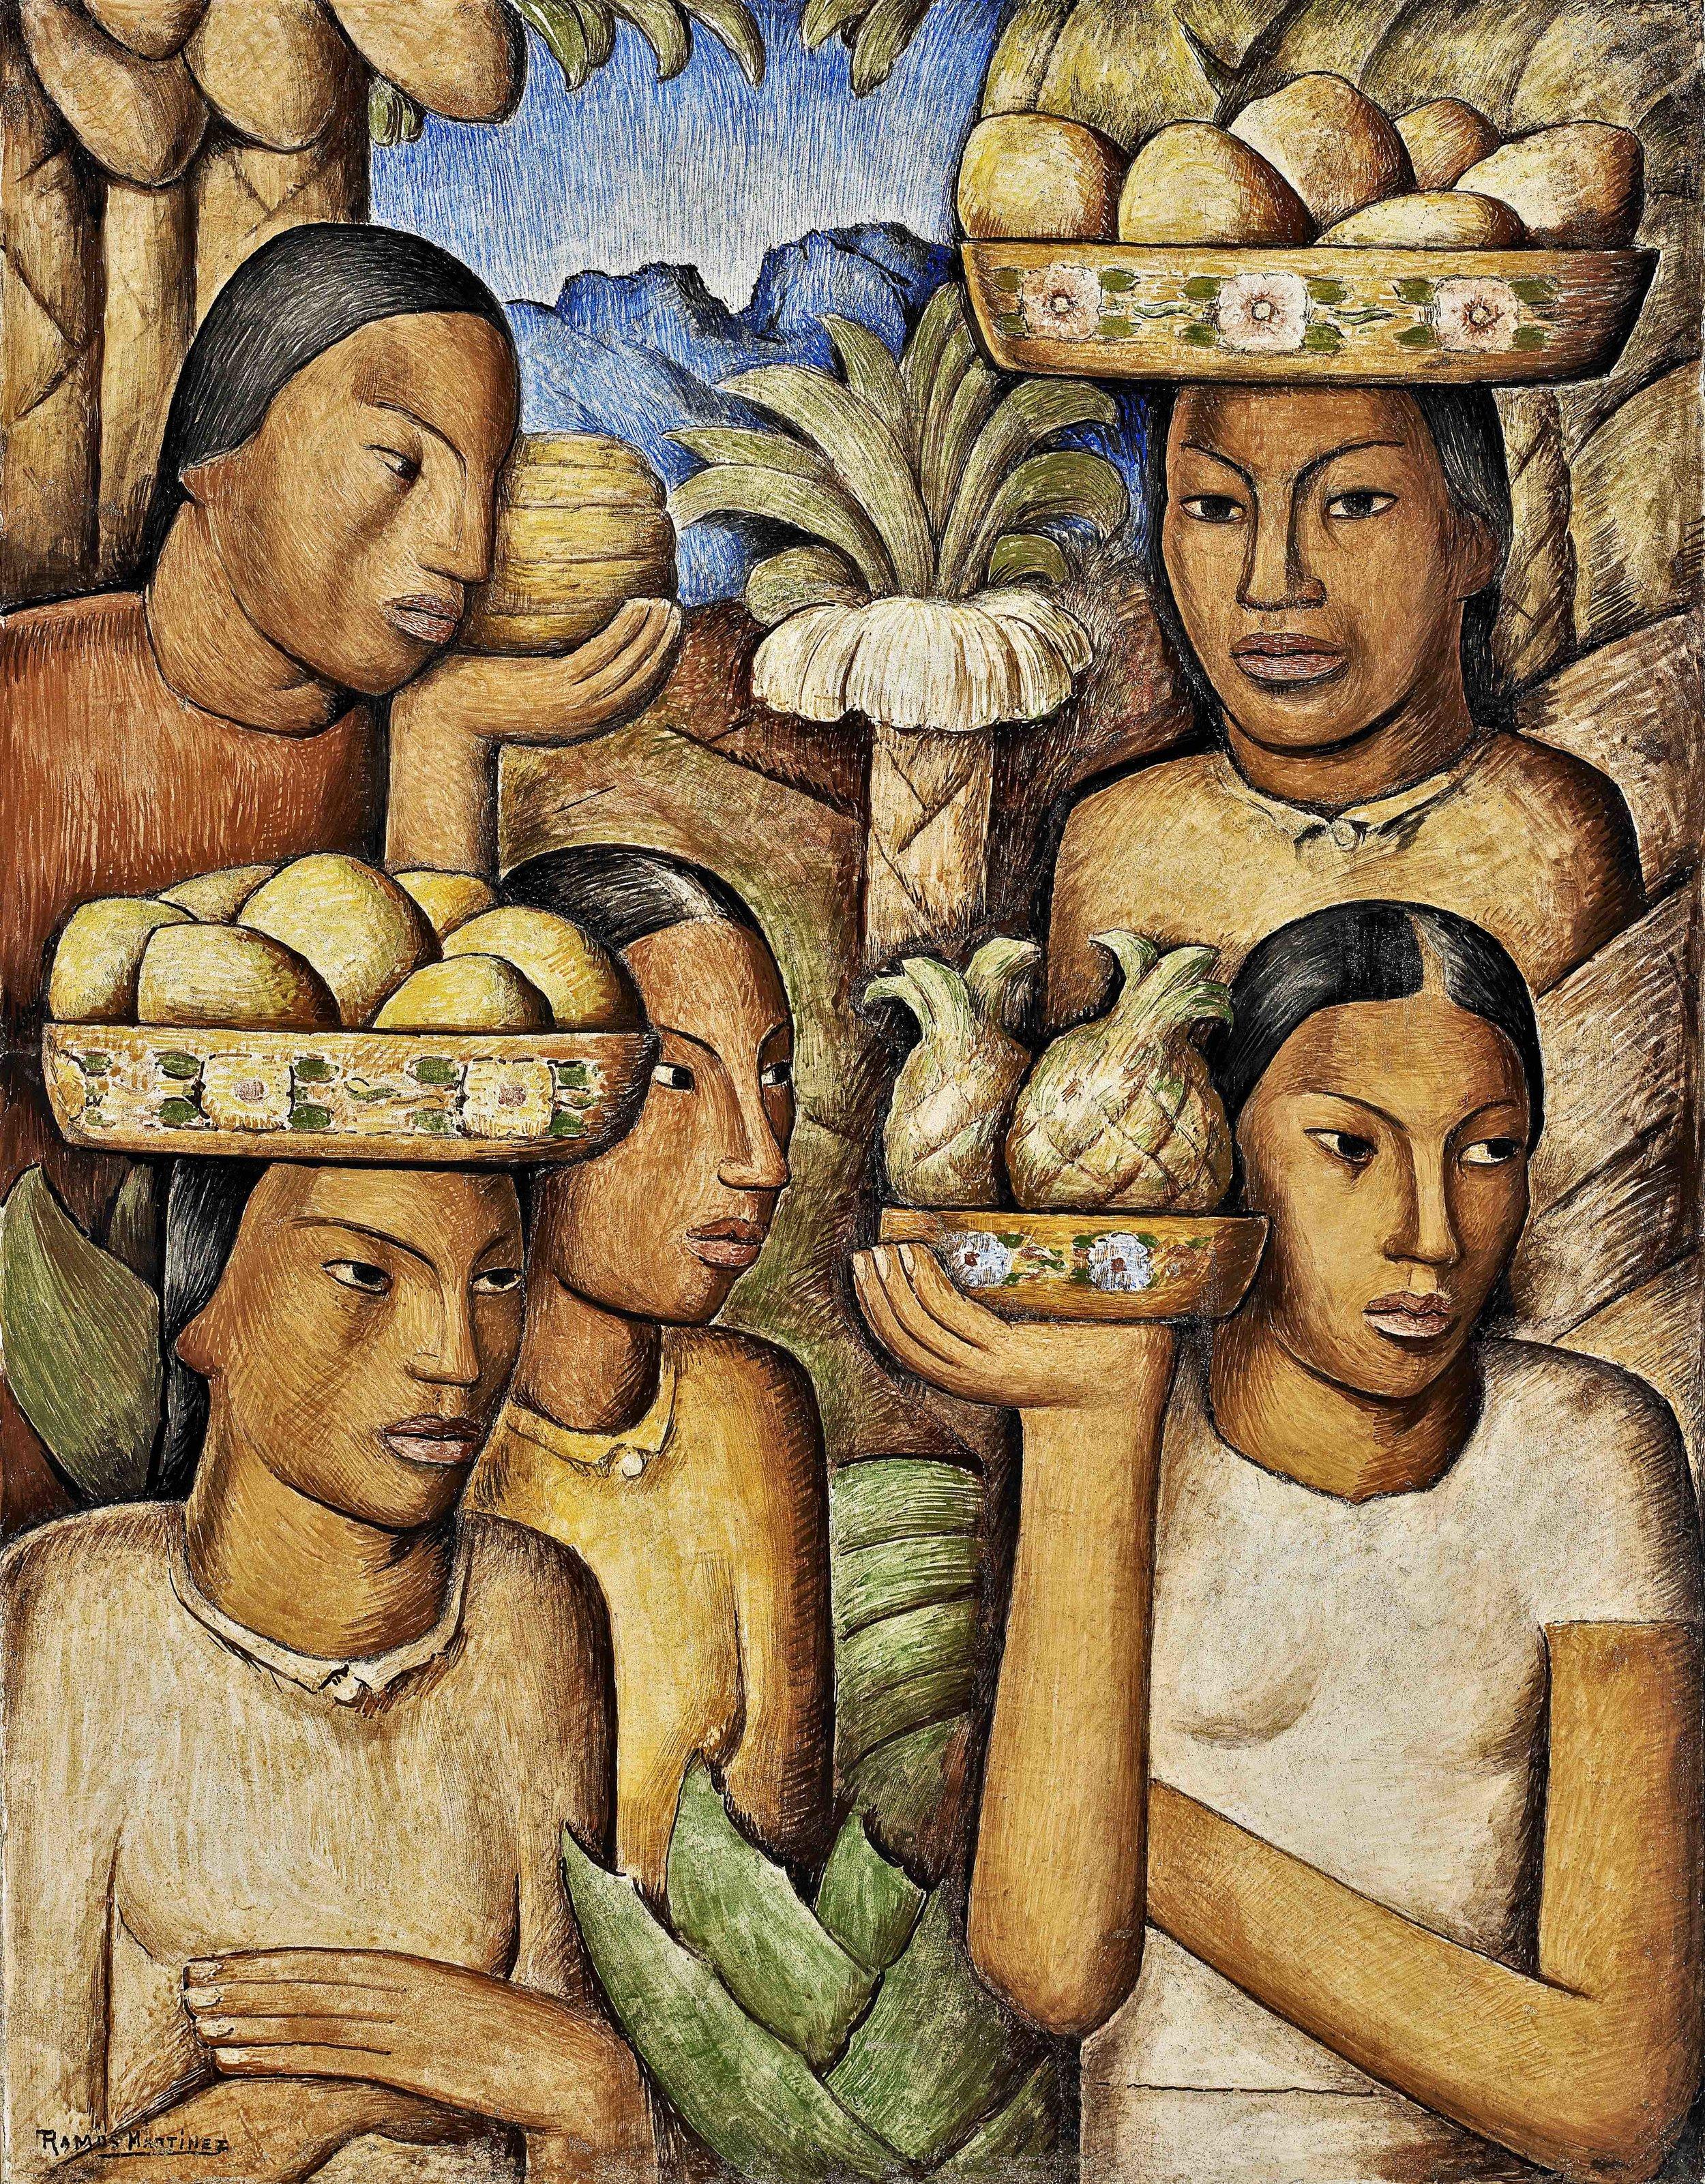 Vendedoras de Frutas / Fruit Vendors  ca. 1937 fresco 31 x 24 inches; 78.7 x 61 centímetros Private collection